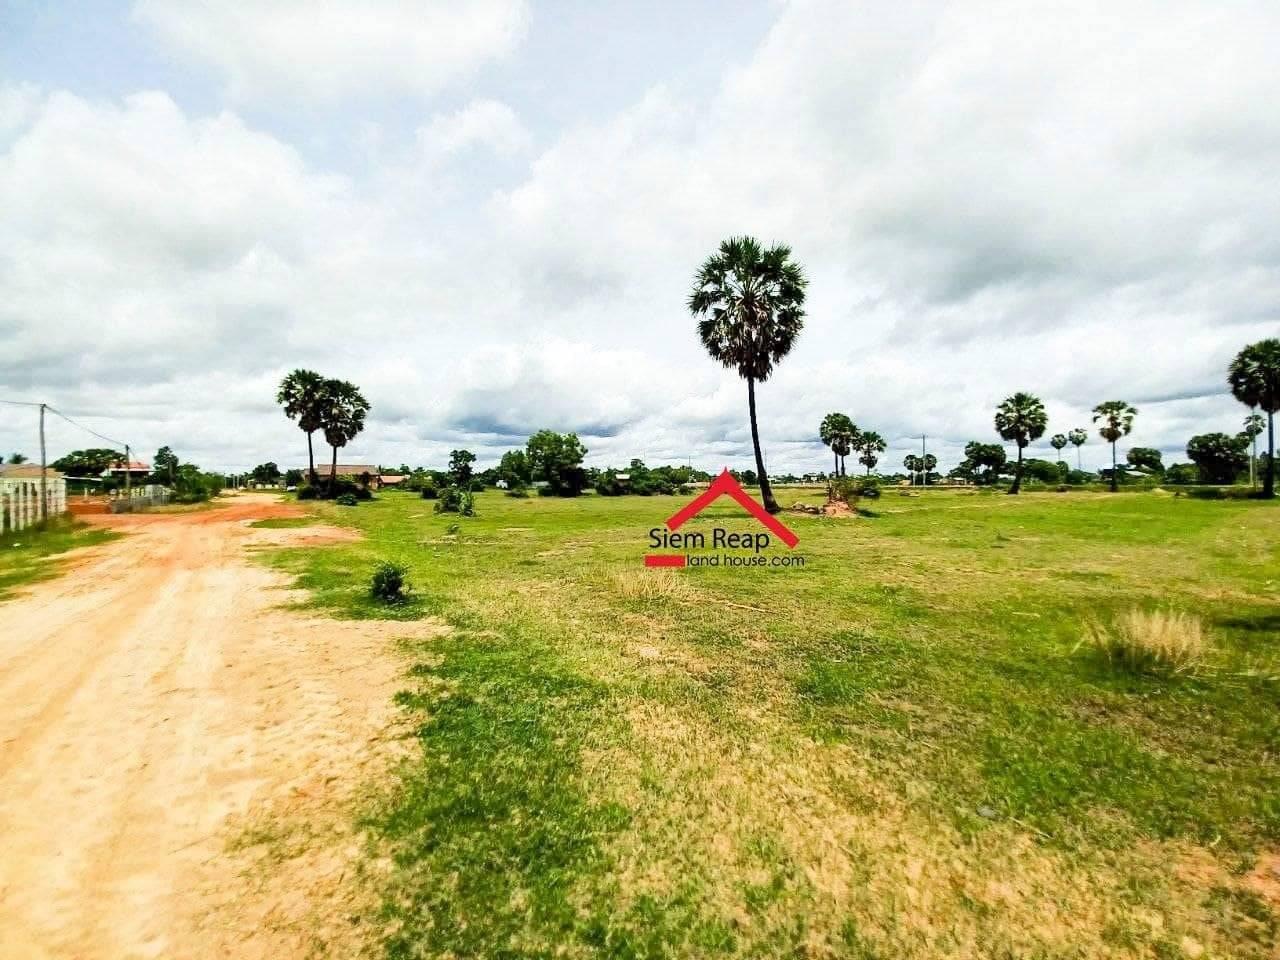 1 78 Siem Reap